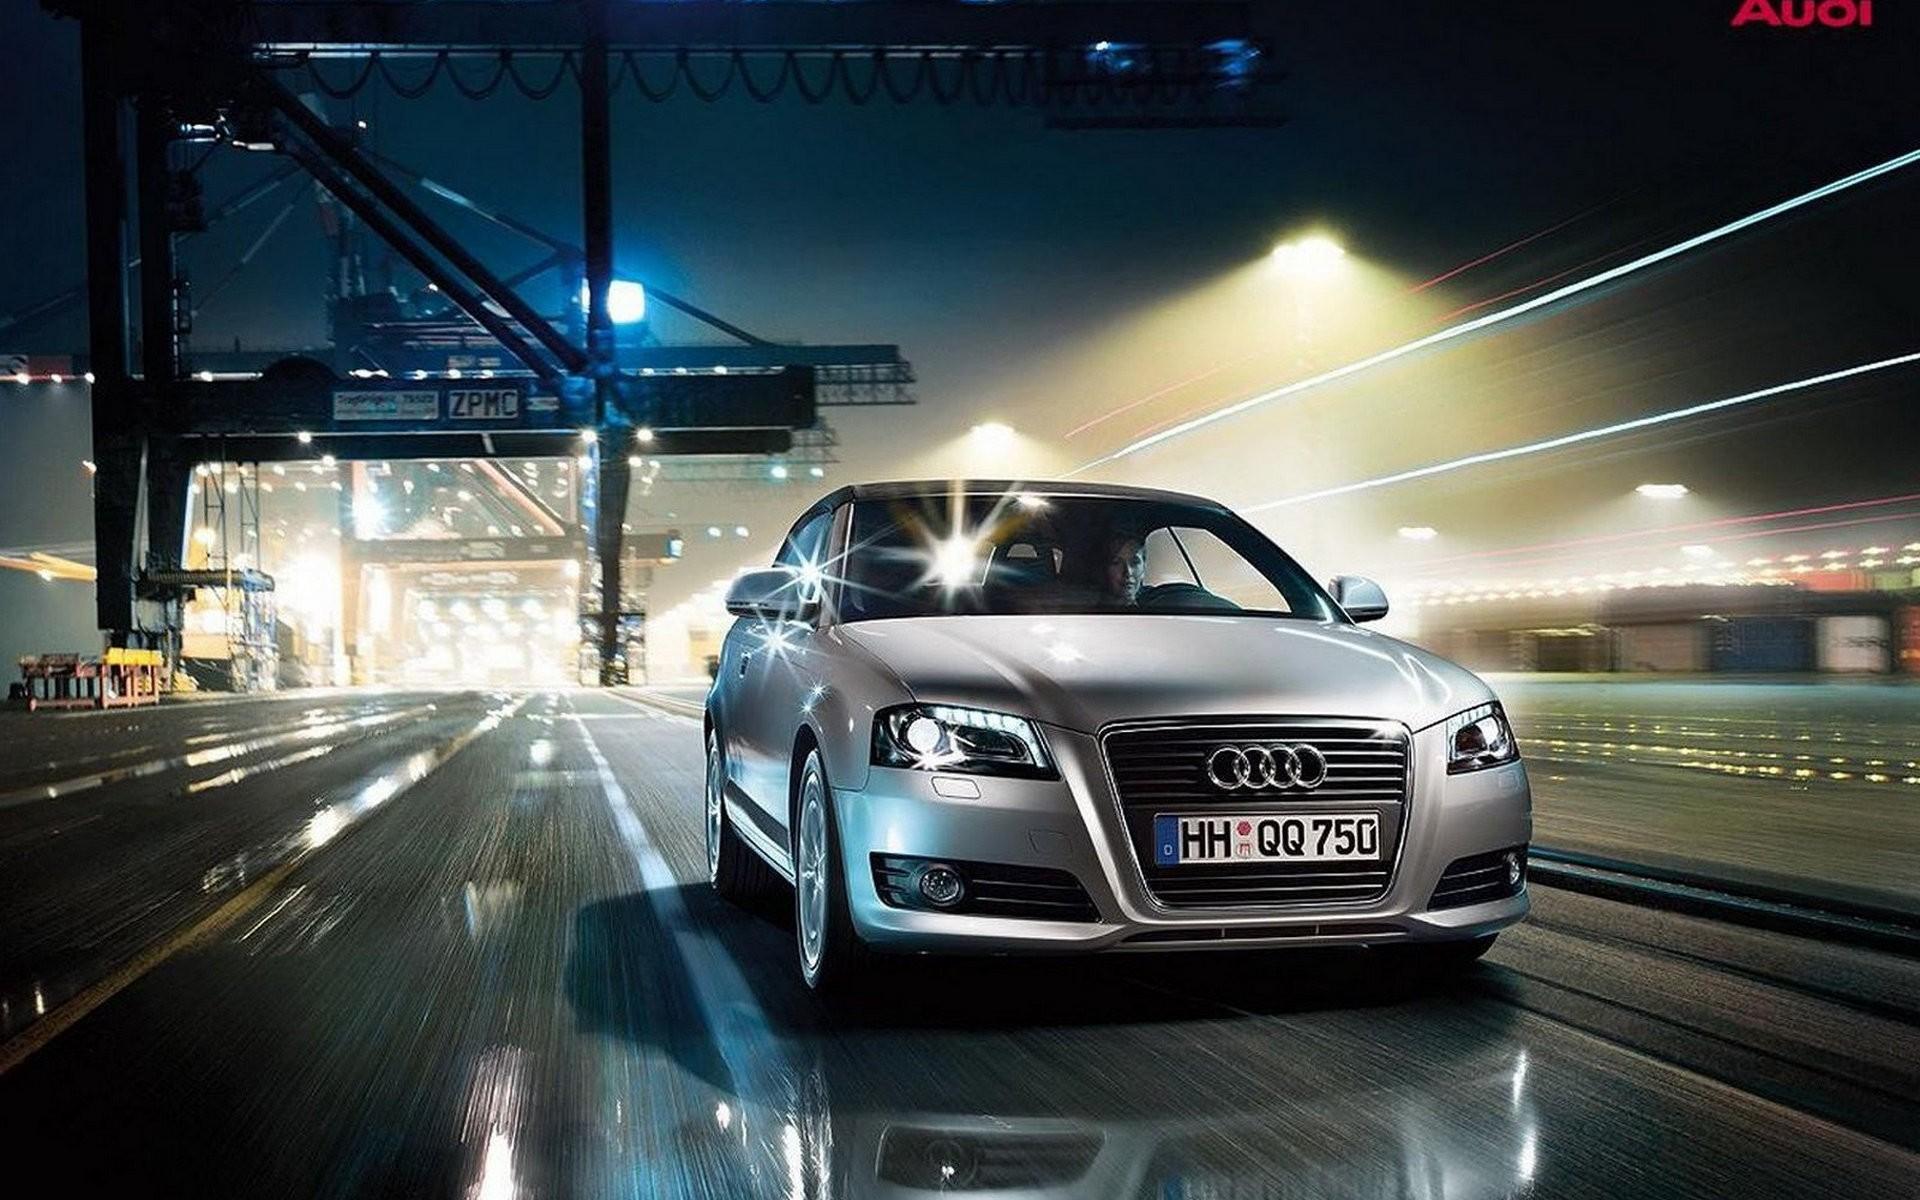 Audi A3 HD Wallpaper 2234 1920x1200